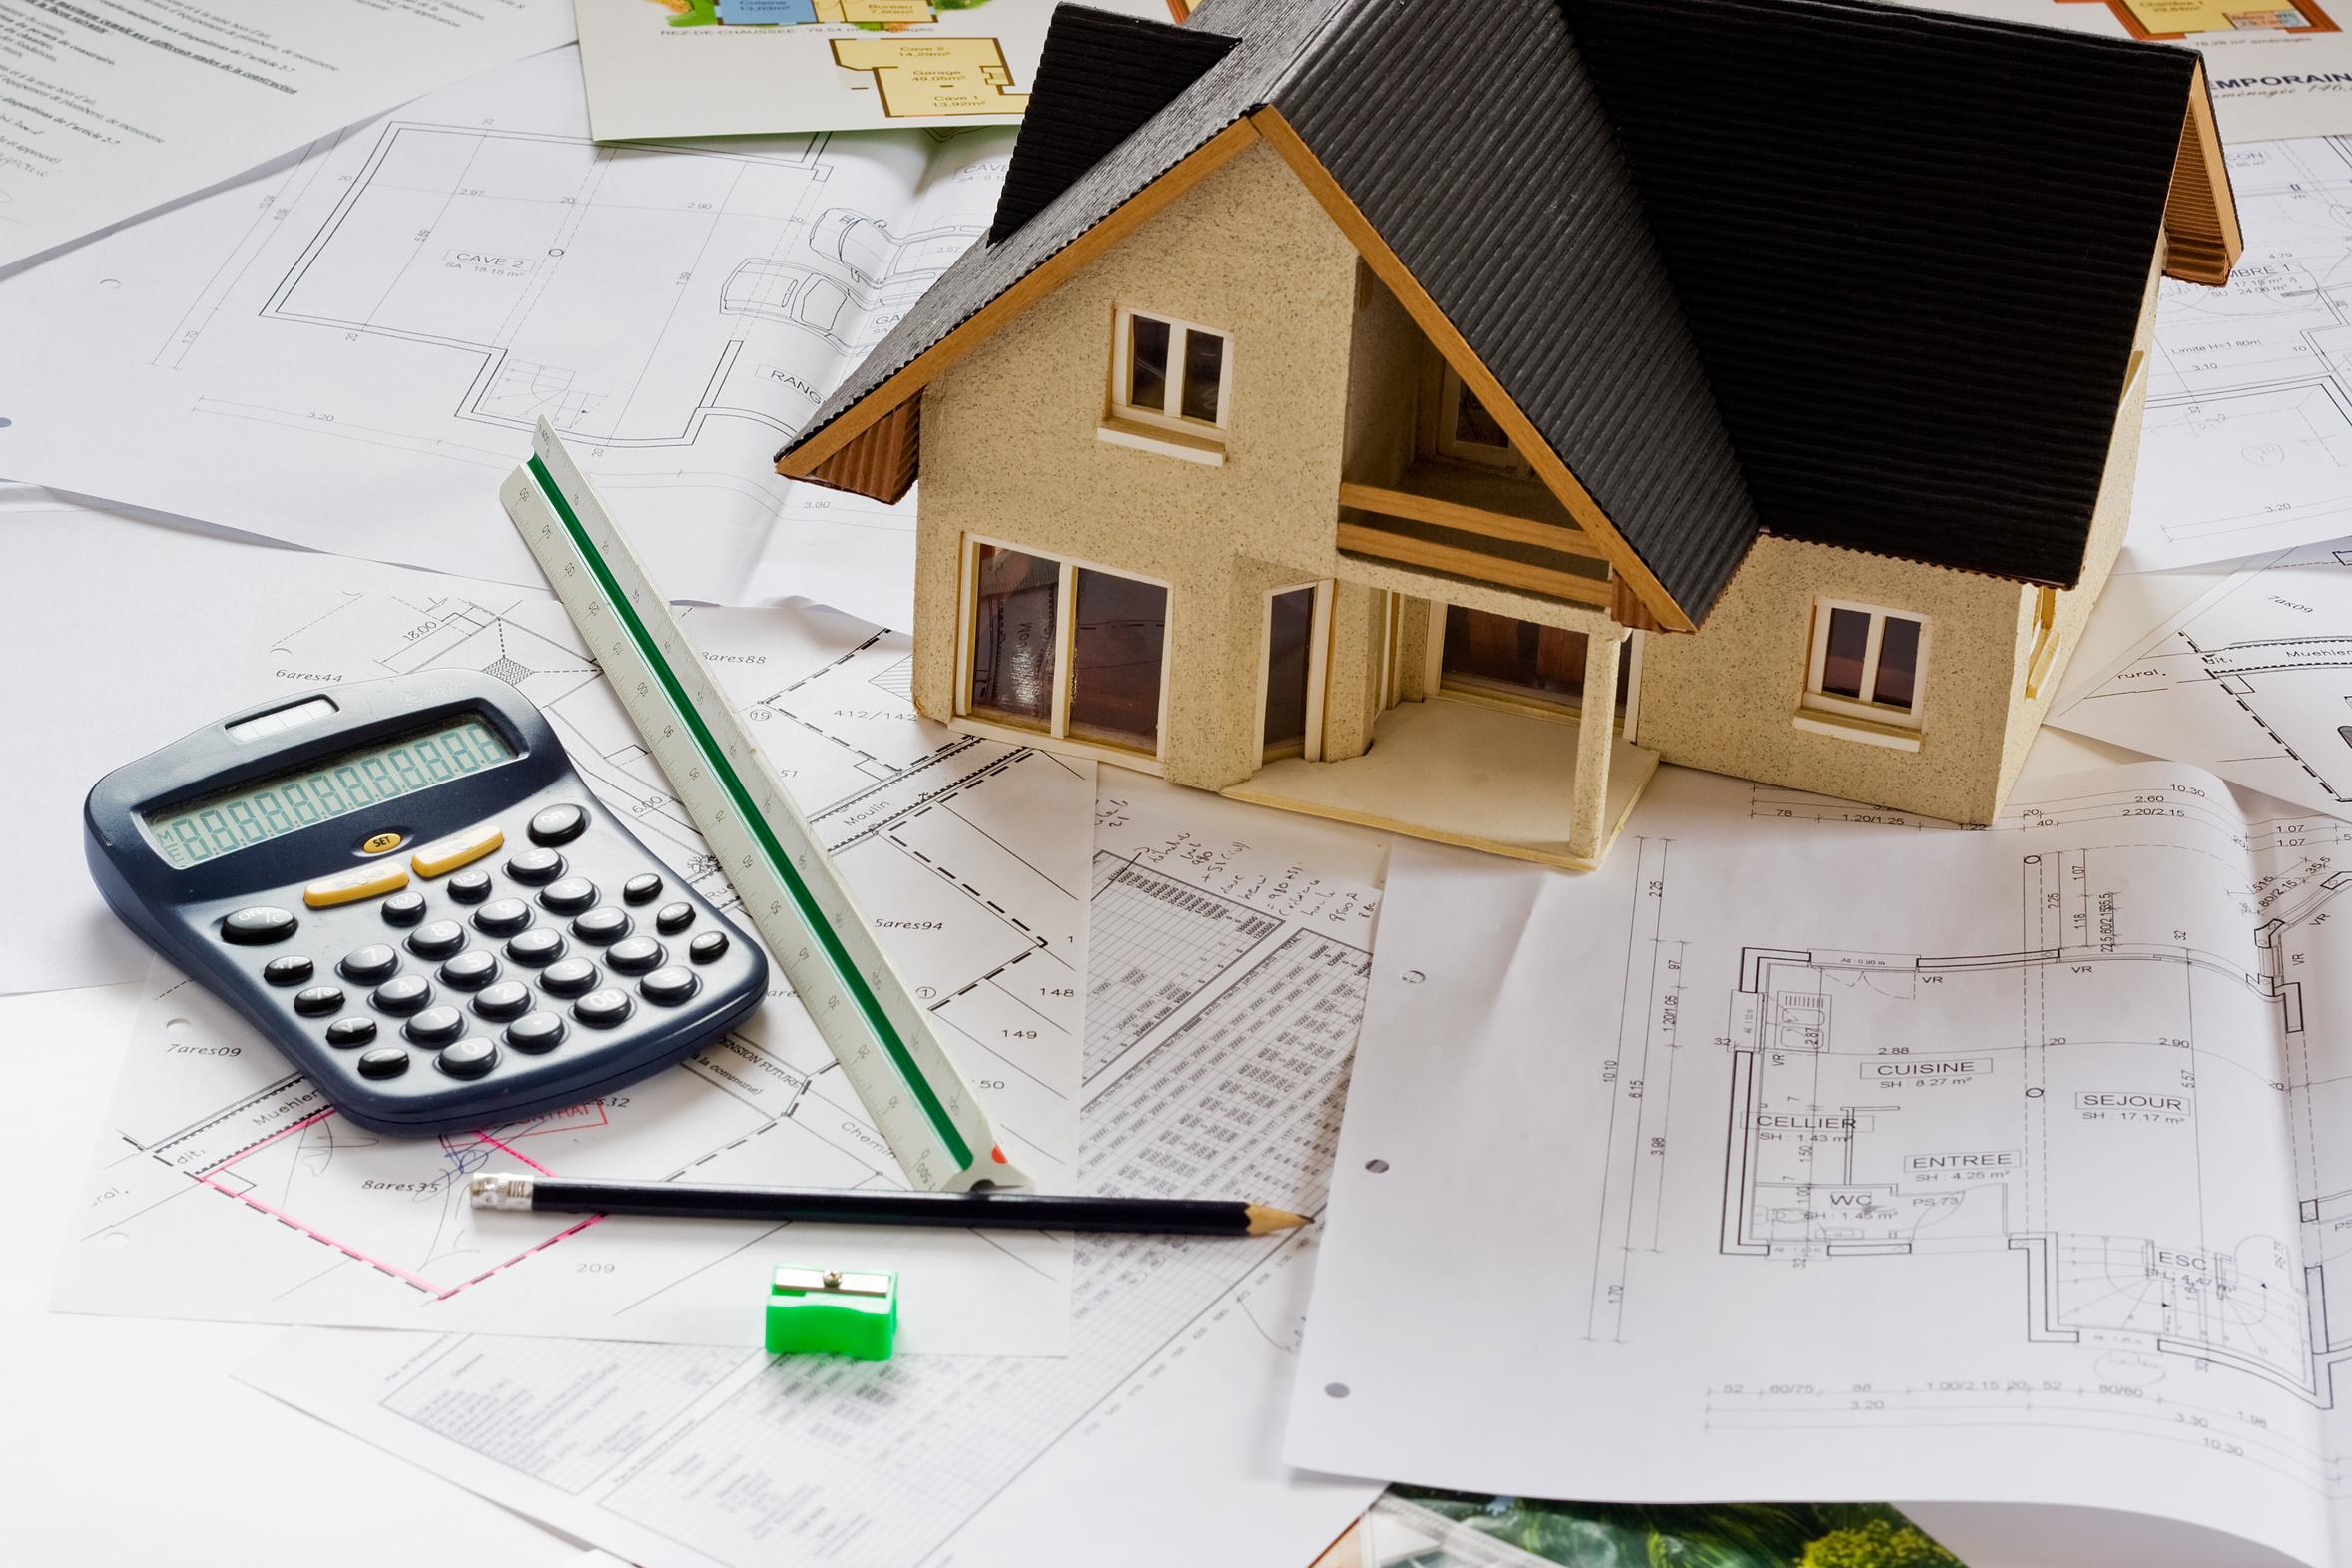 achat-immobillier-12.jpg